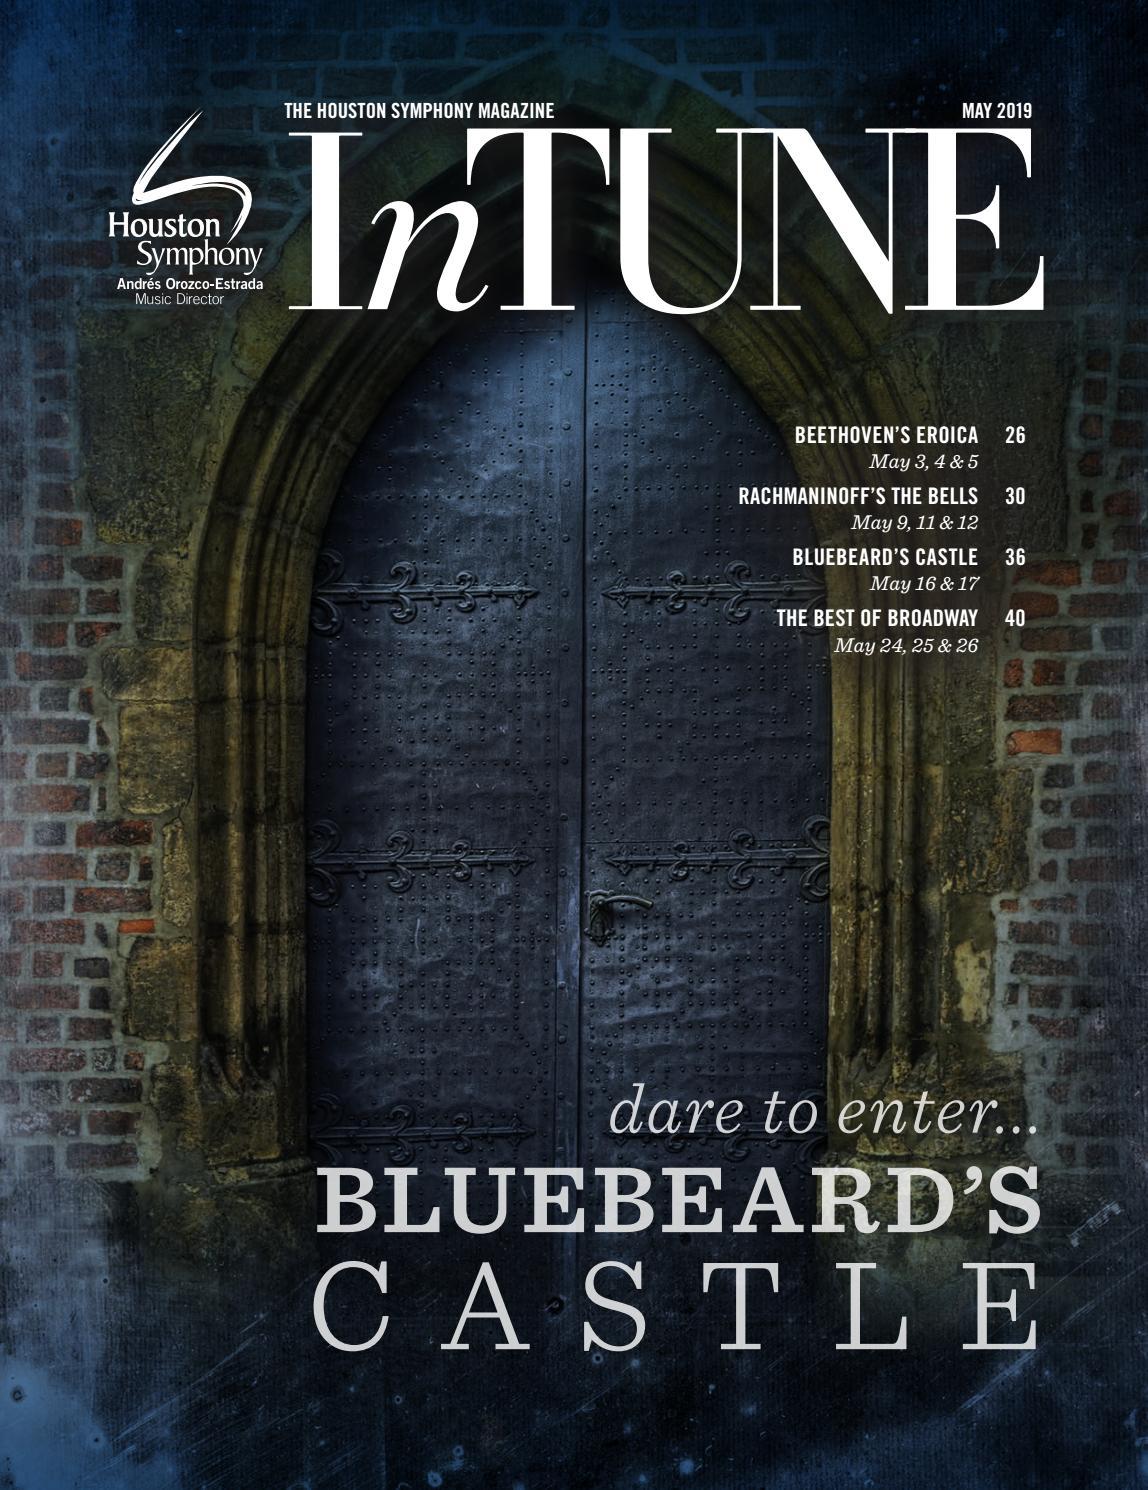 InTune — The Houston Symphony Magazine — May 2019 by Houston